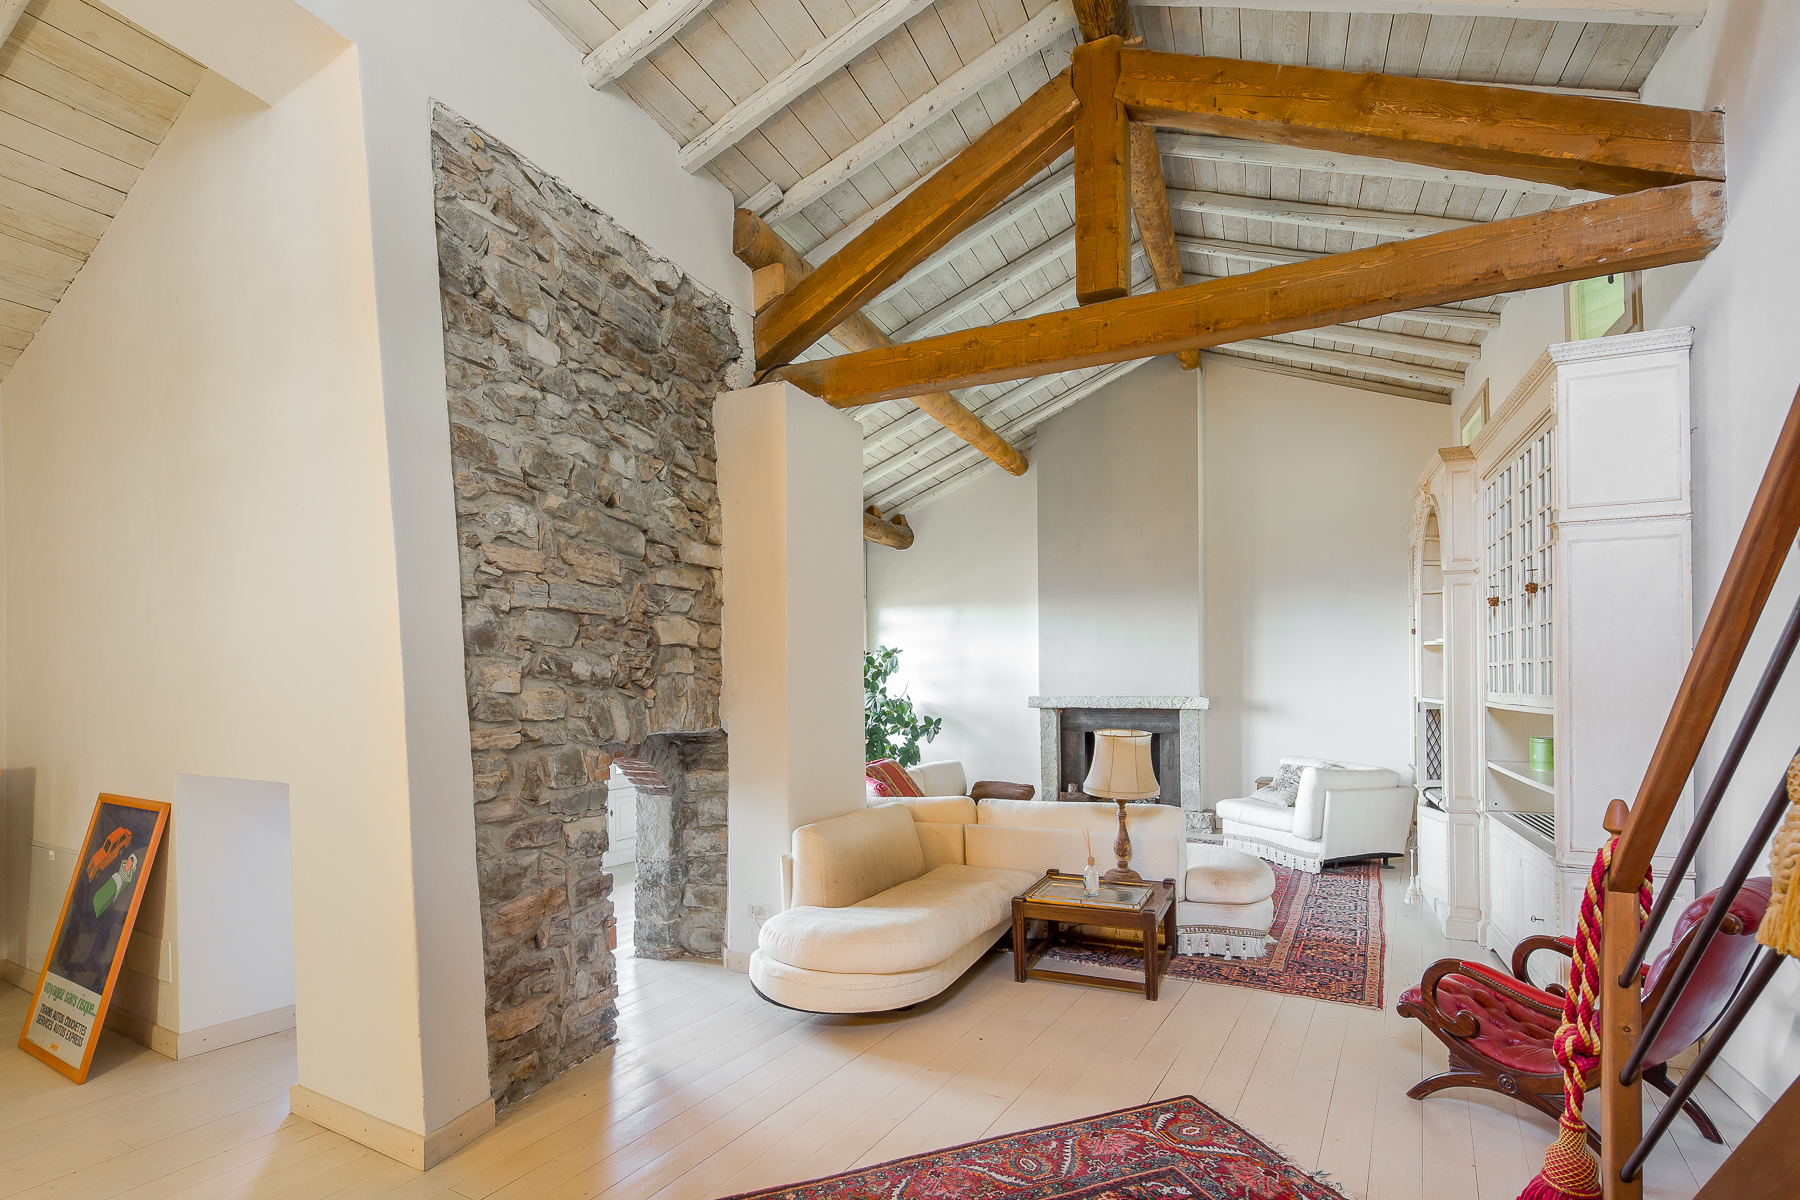 Casa indipendente in Vendita a Caprino Bergamasco: 5 locali, 500 mq - Foto 8